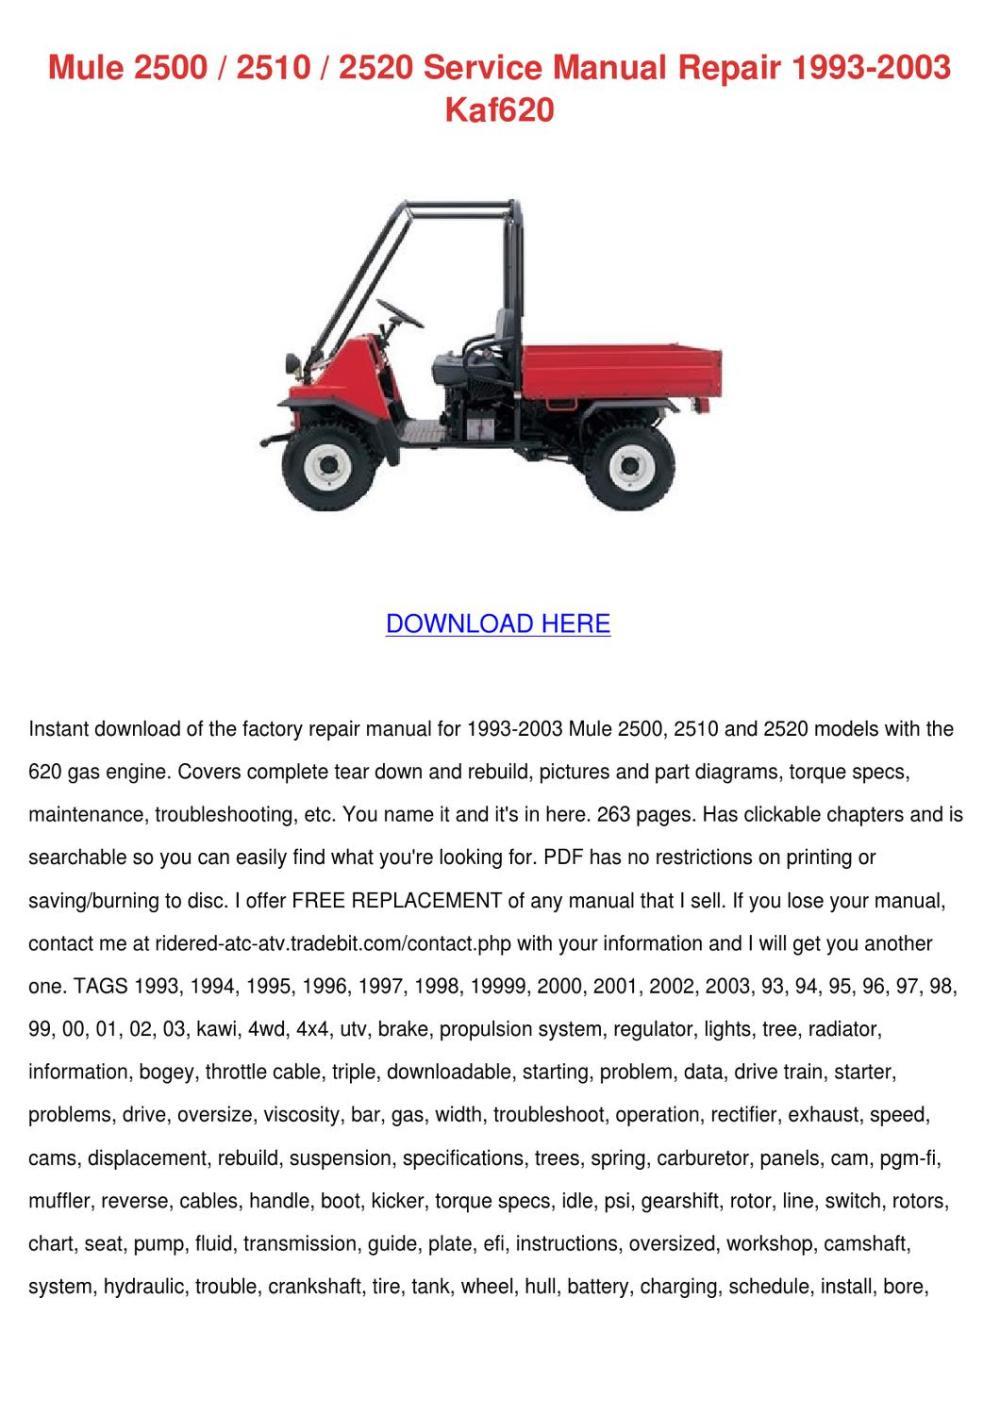 medium resolution of mule 2500 2510 2520 service manual repair 199 by kathryn gressman issuu